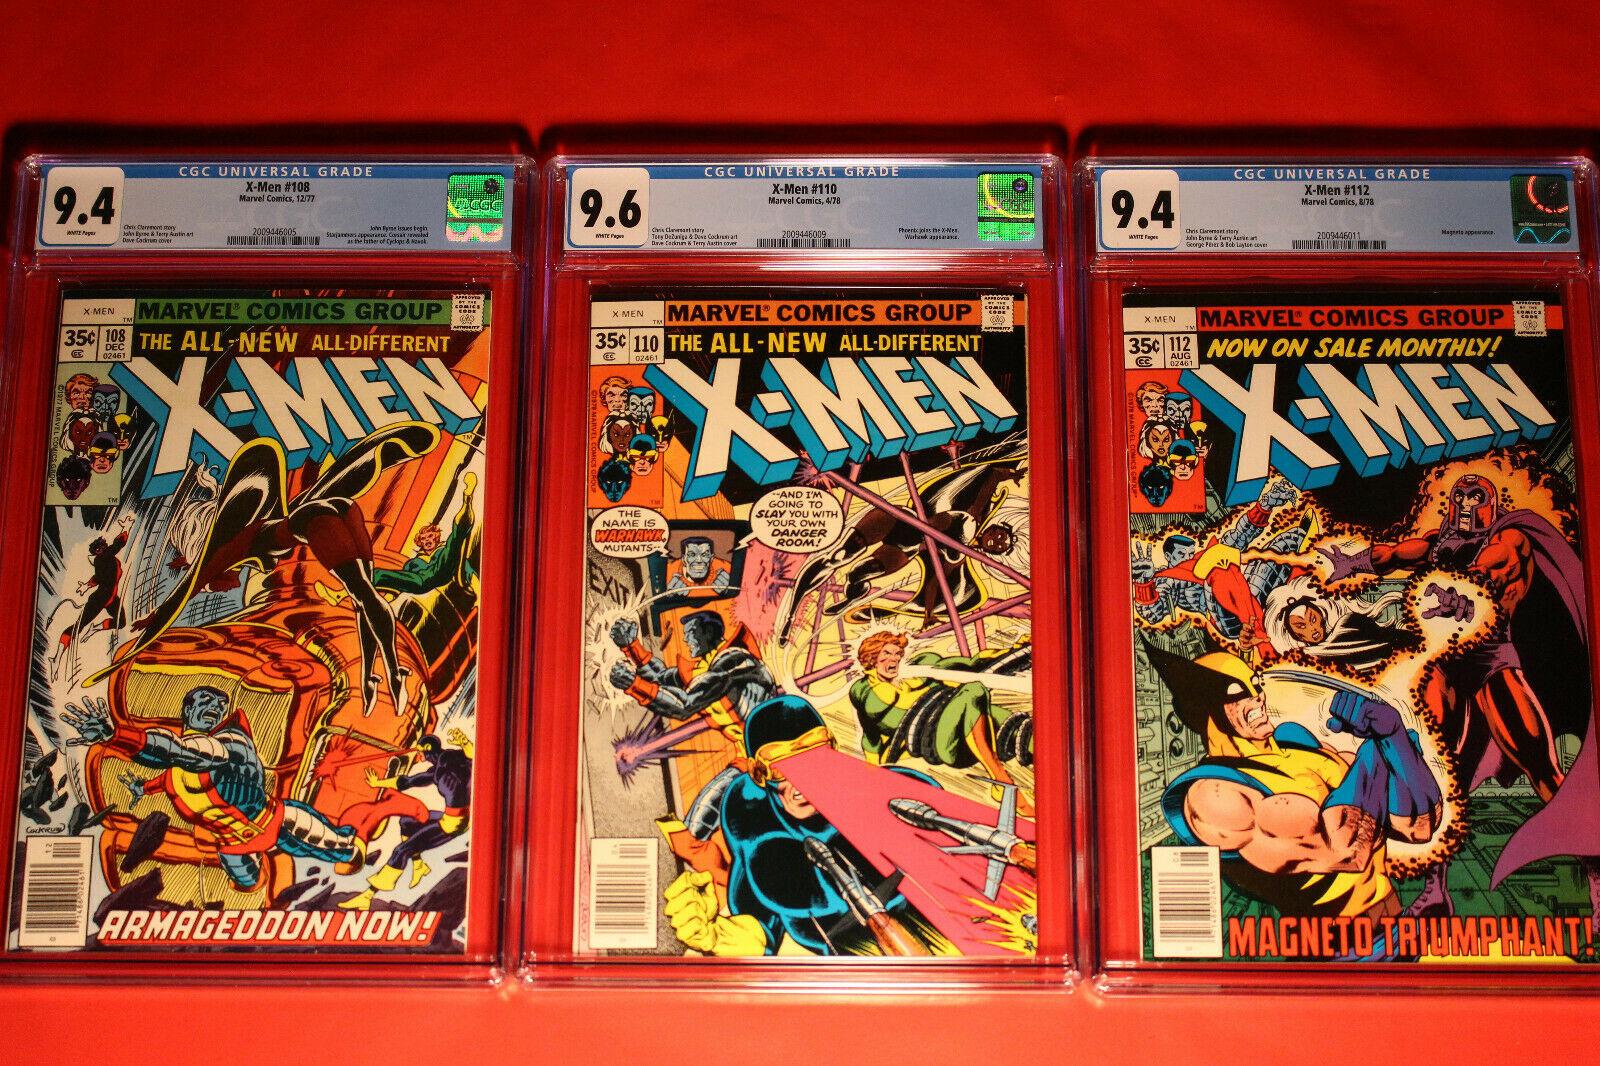 3 X-MEN ISSUE LOT #'s 108, 110, 112 CGC 9.4 NM / 9.6 NM+ UNCANNY MARVEL GROUP